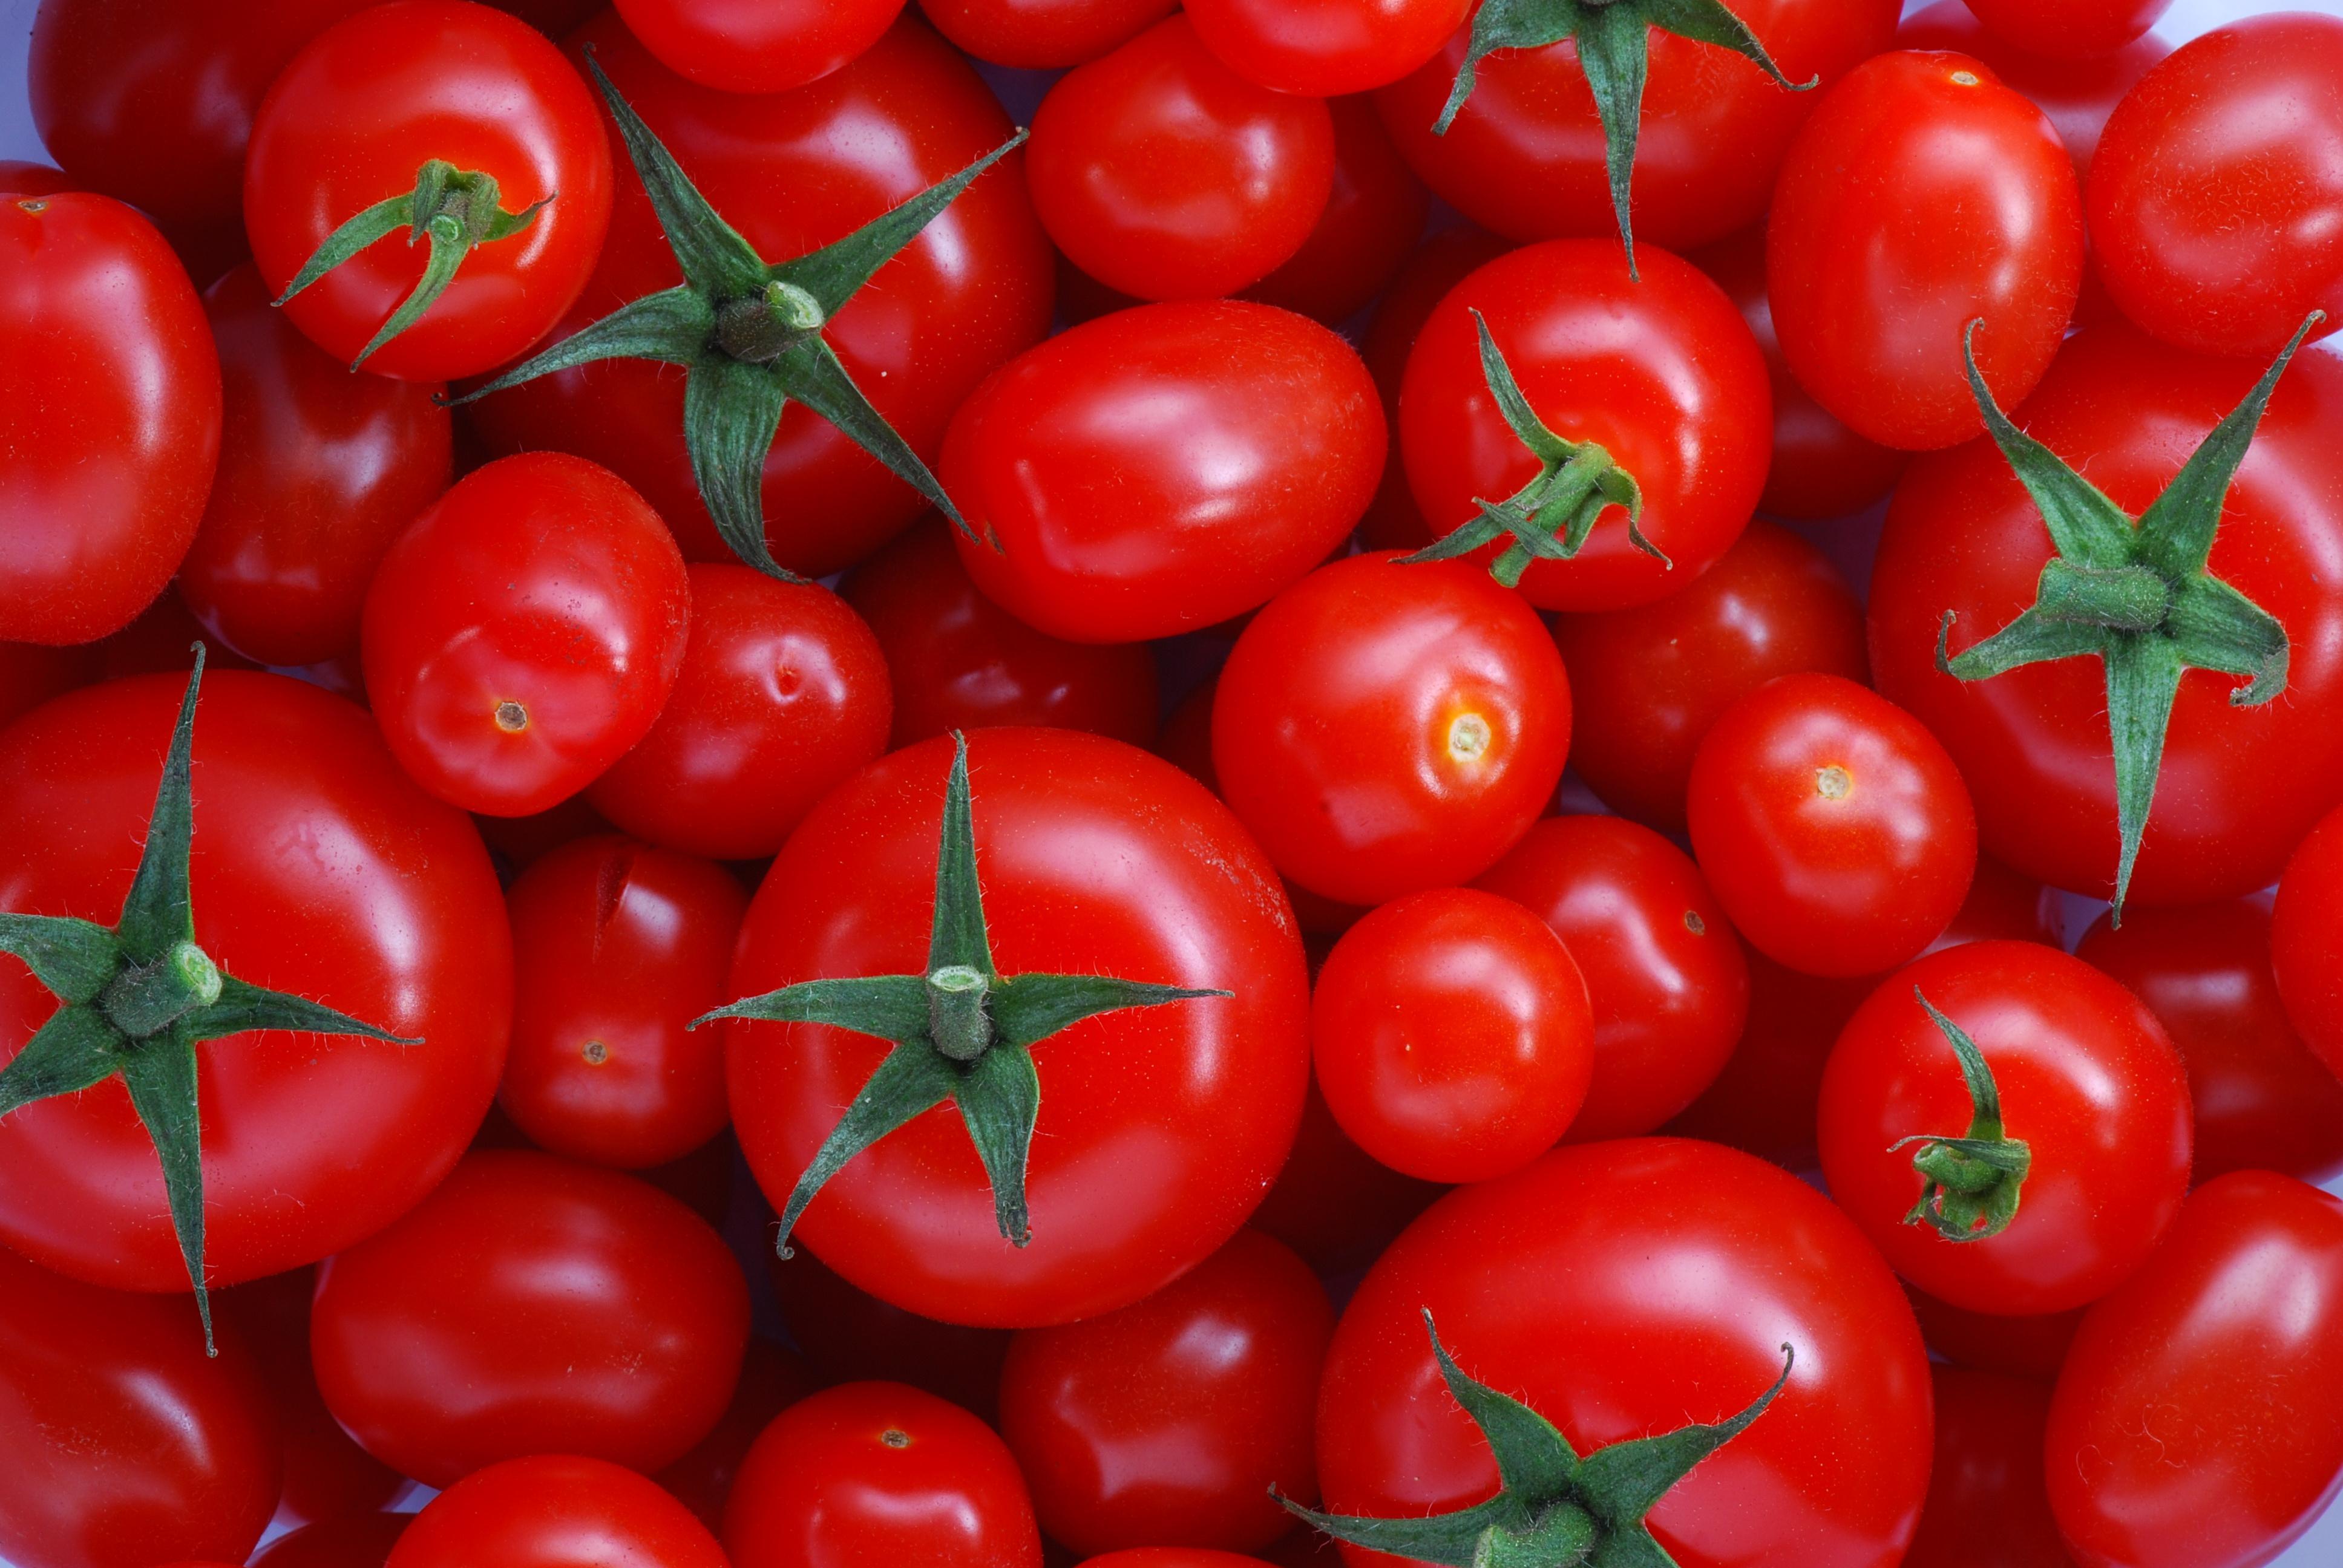 tomate foto buena, tomate de huerta